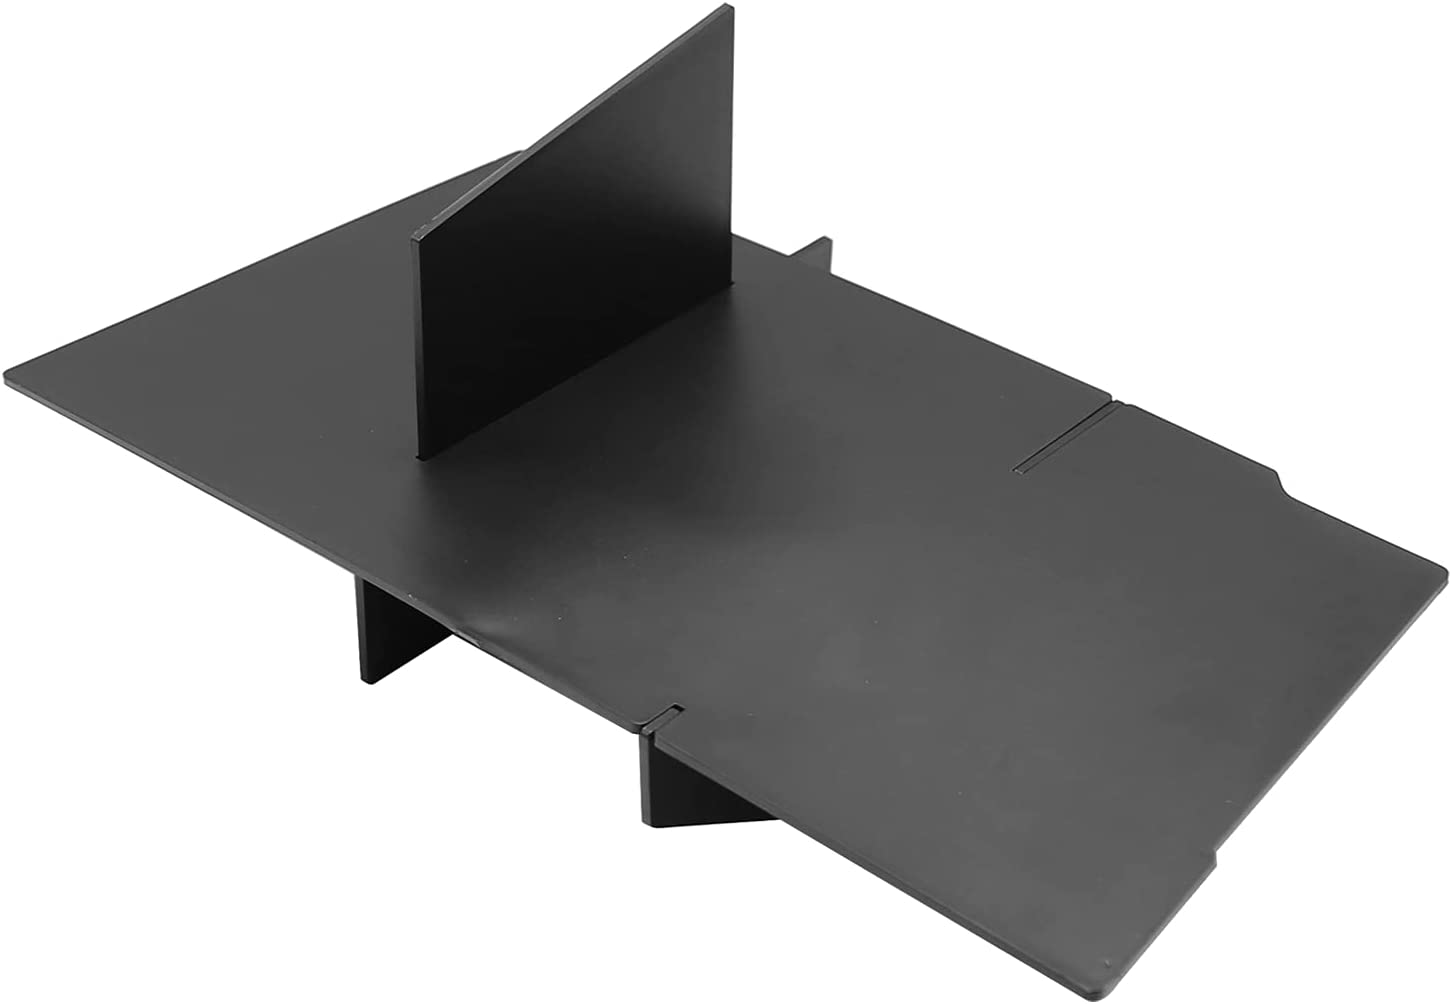 Glove Box Organizer Compartment Max 81% OFF Accessories Great interest Insert Replace